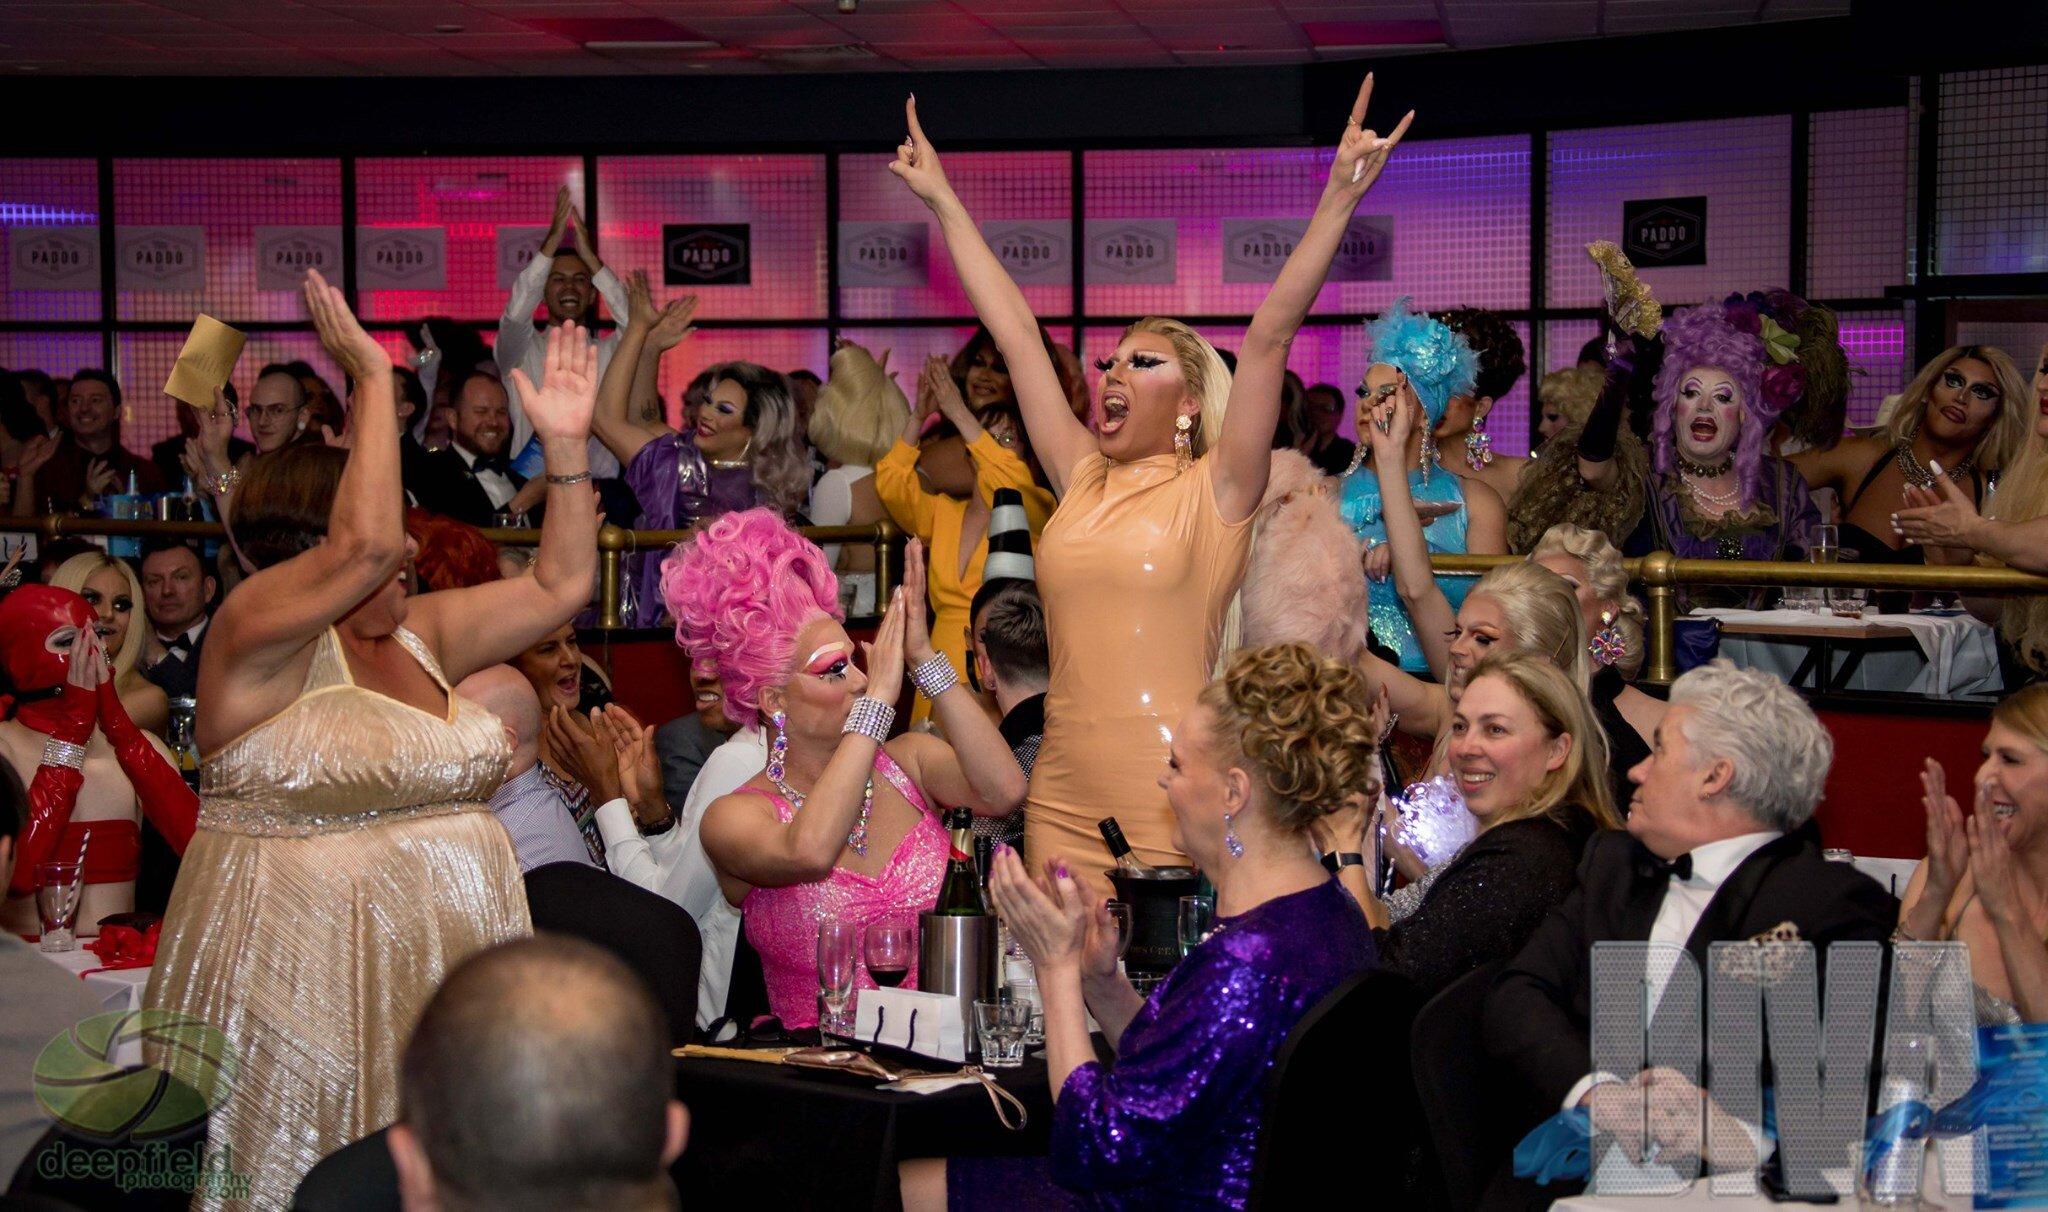 decoda-secret-win-moment-diva-awards-sydney-drag-queen-royalty-best-hire-drag-race-australia.jpg